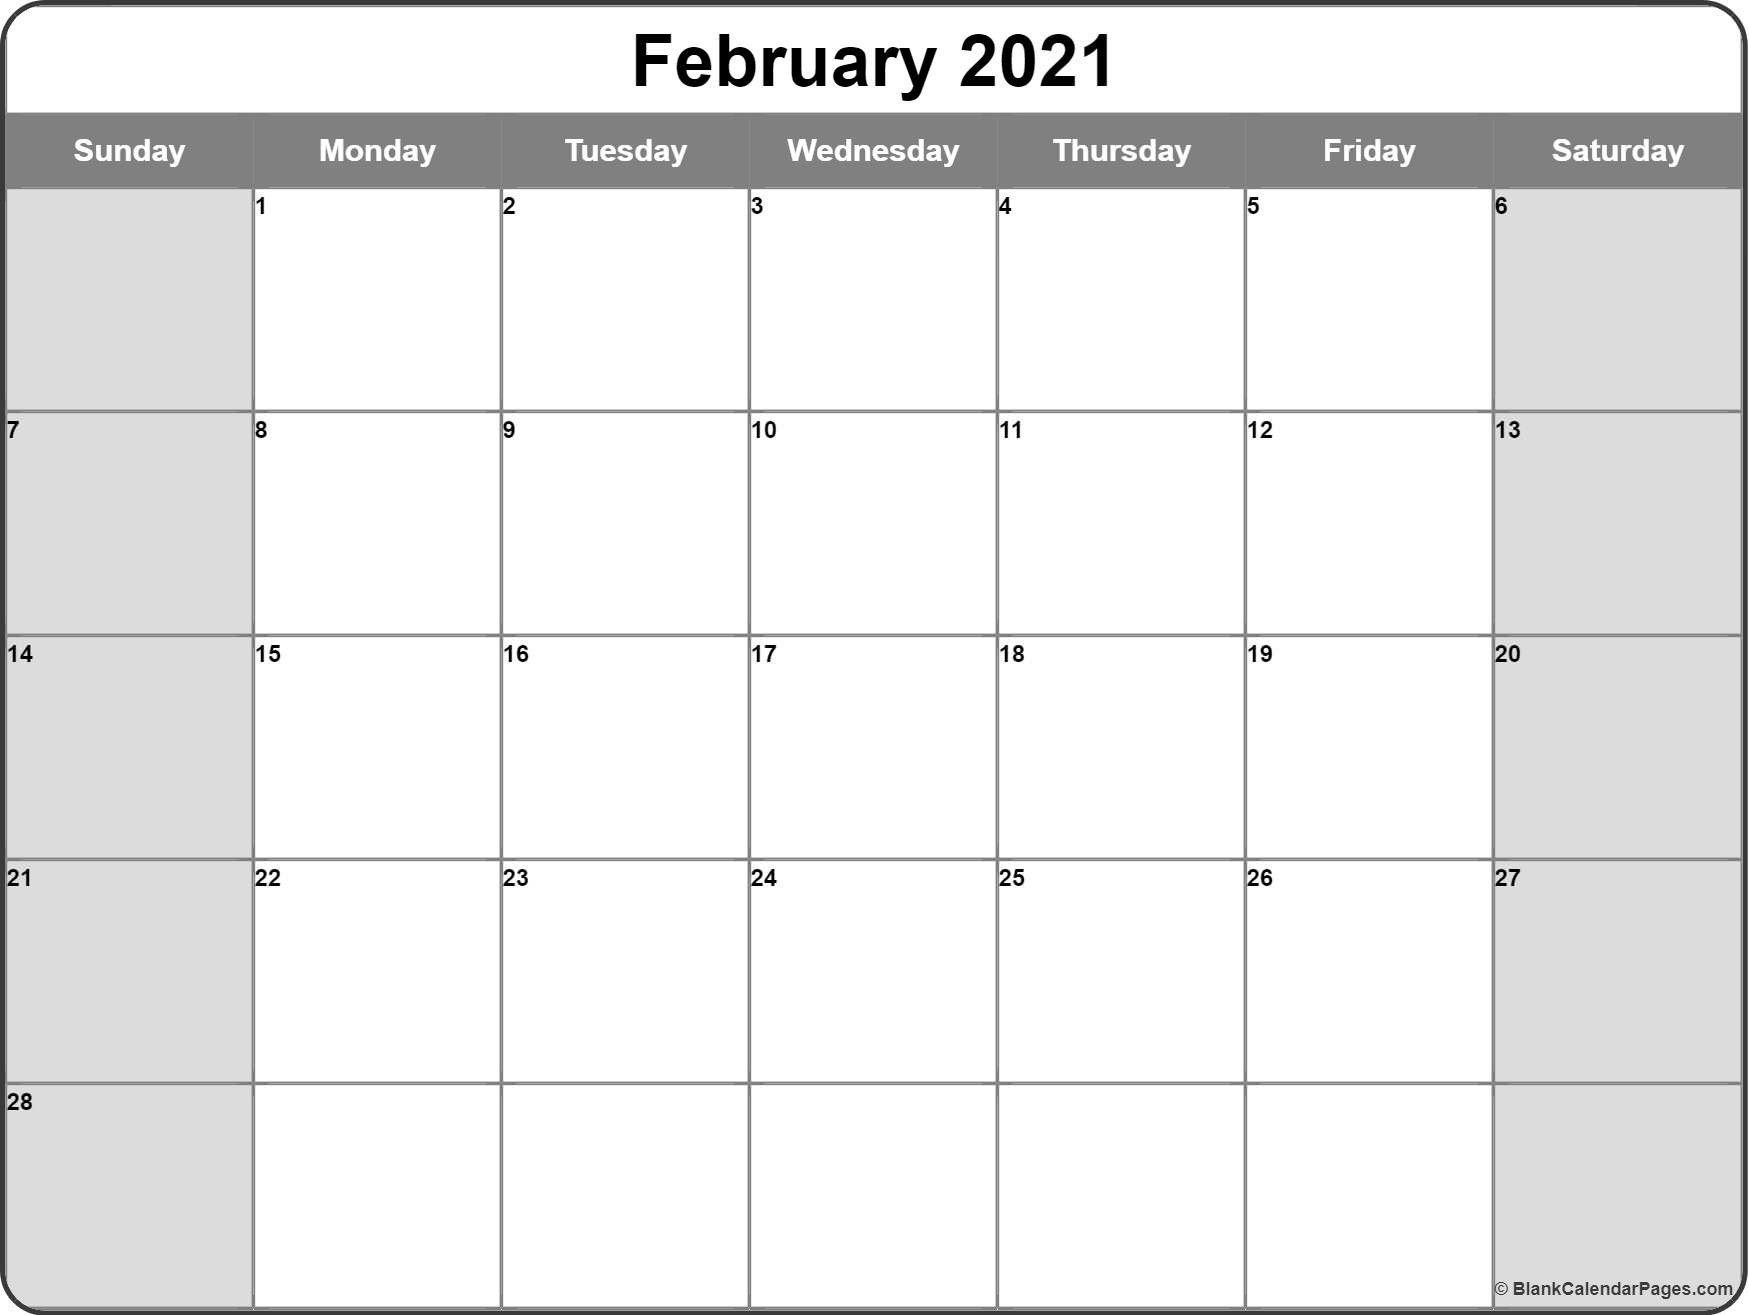 February 2021 Calendar Free Printable | Monthly Calendar